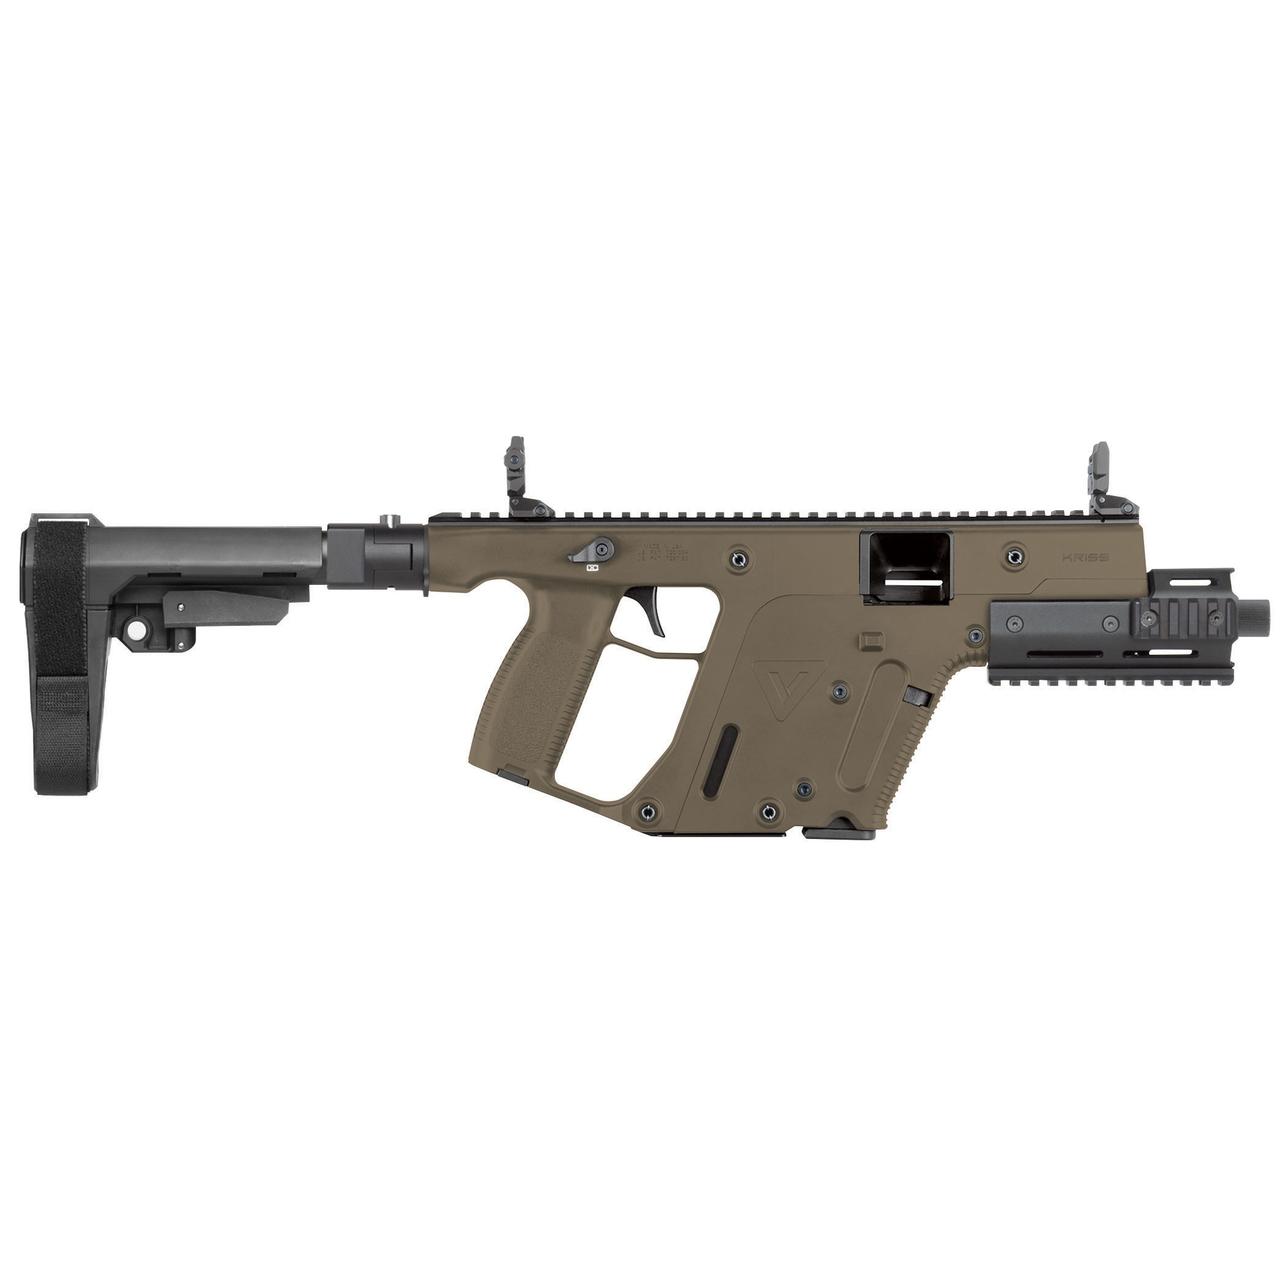 image black and white stock Kriss sdp sbxk mm. Vector 10mm gun price